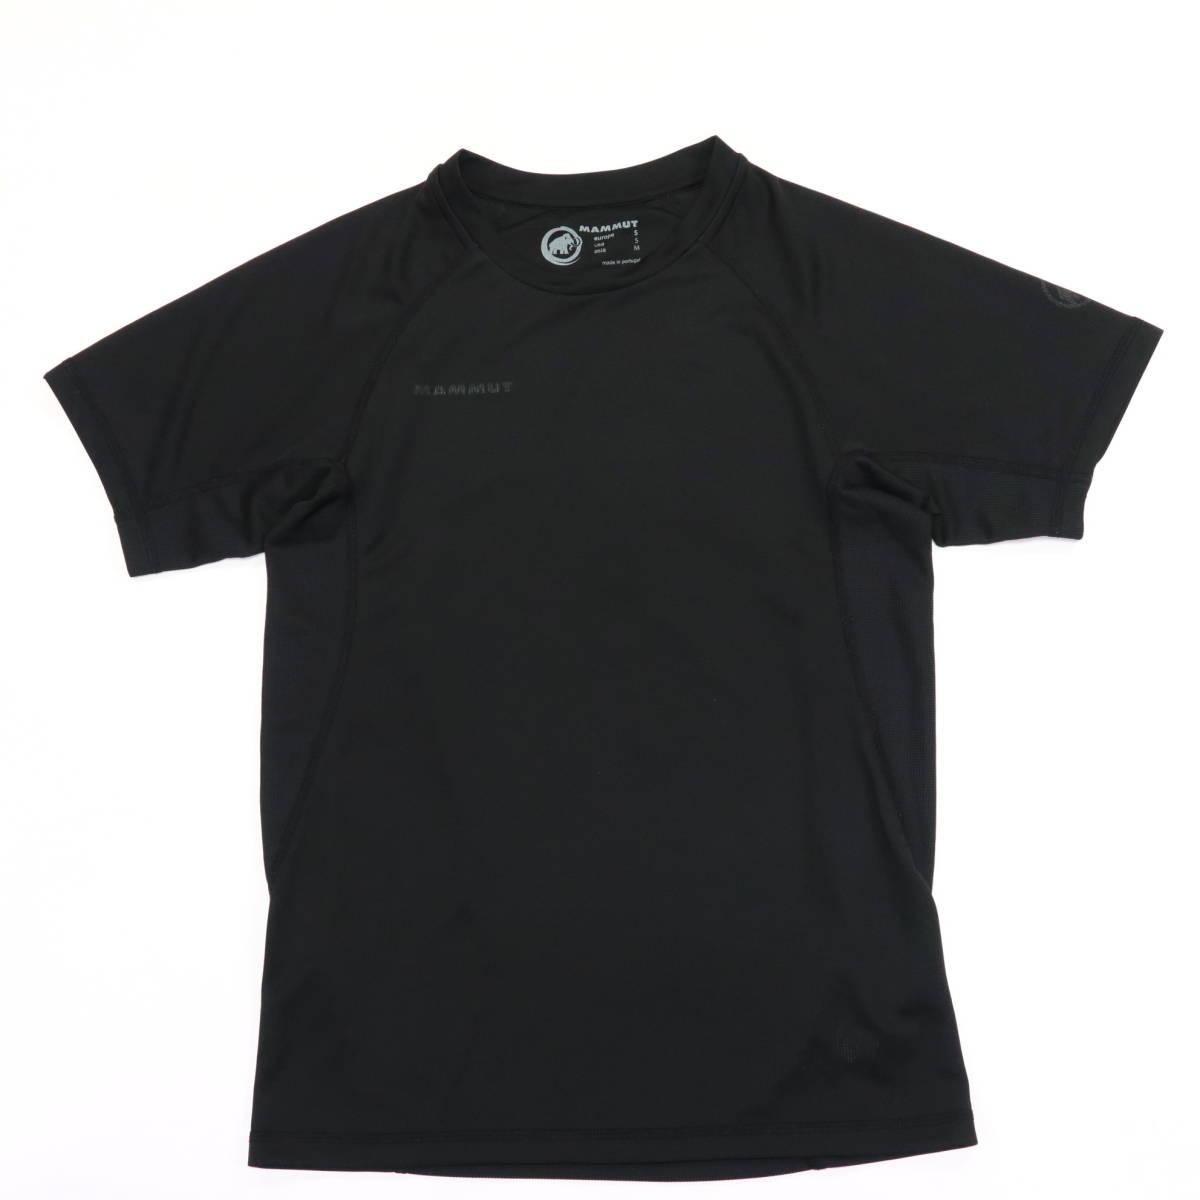 "MAMMUT"" Womens M ""quick-drying・T-shirt Mammut running trekking"